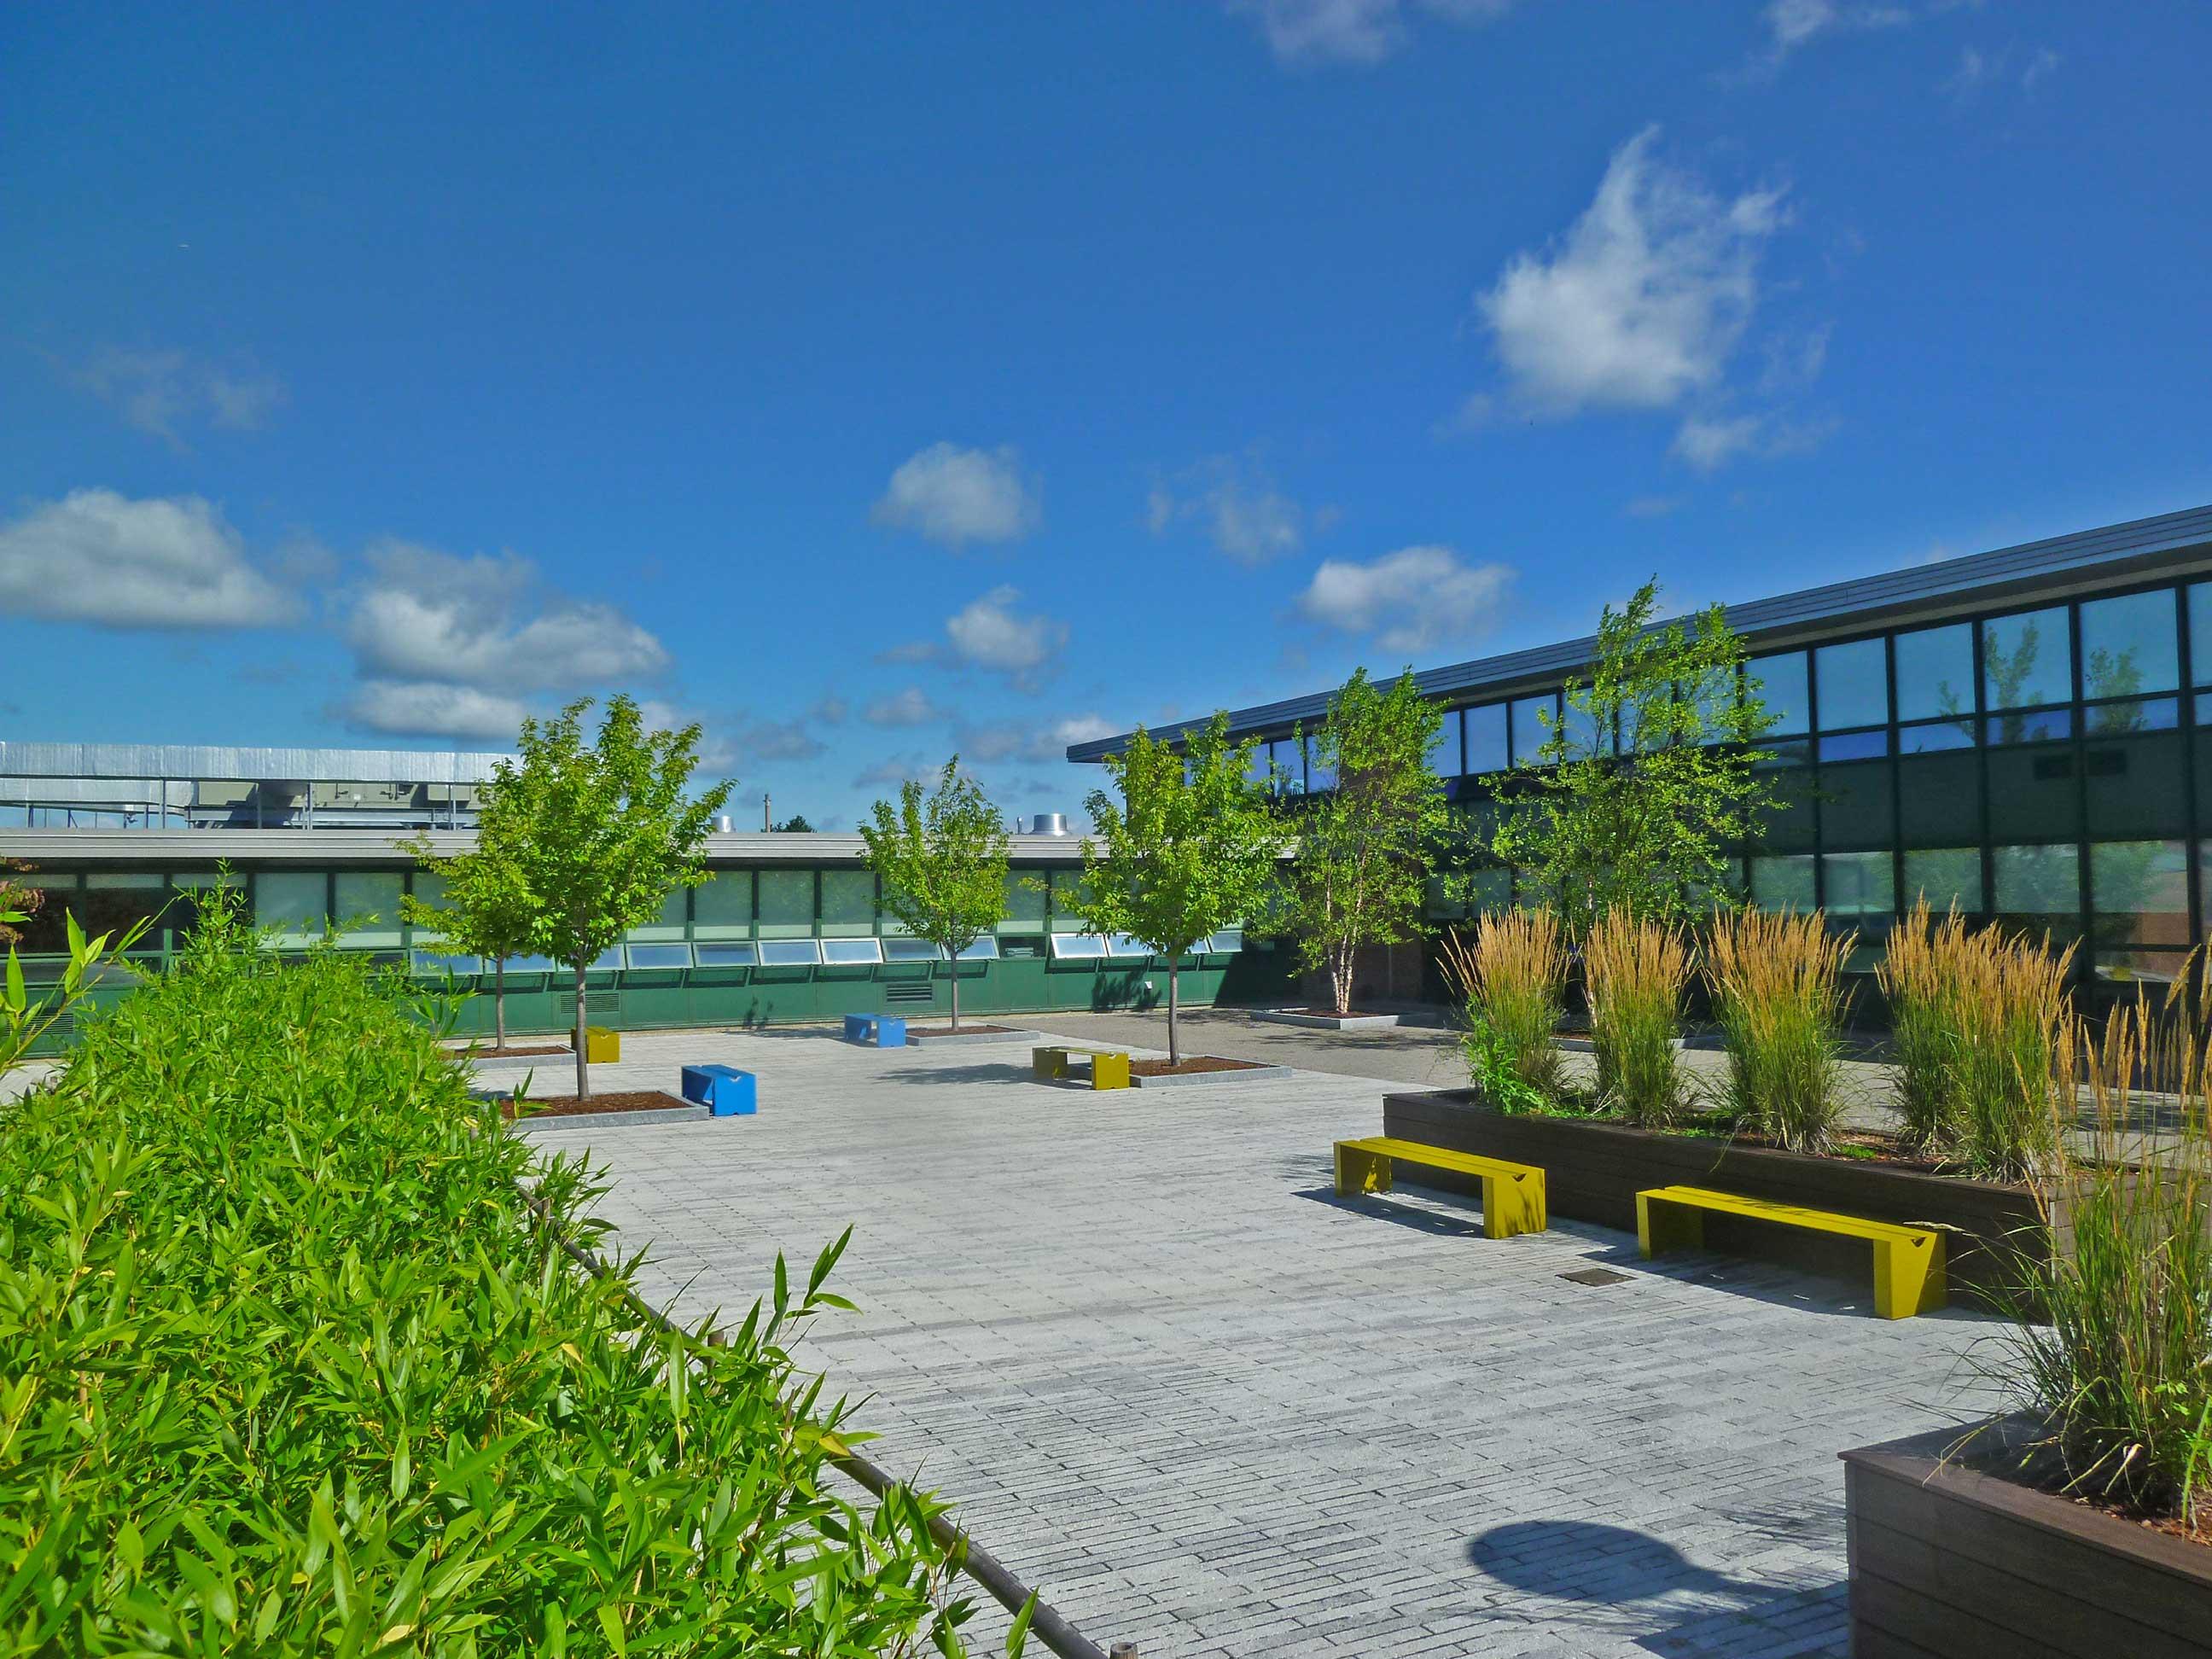 Marshall Simonds Middle School Courtyard